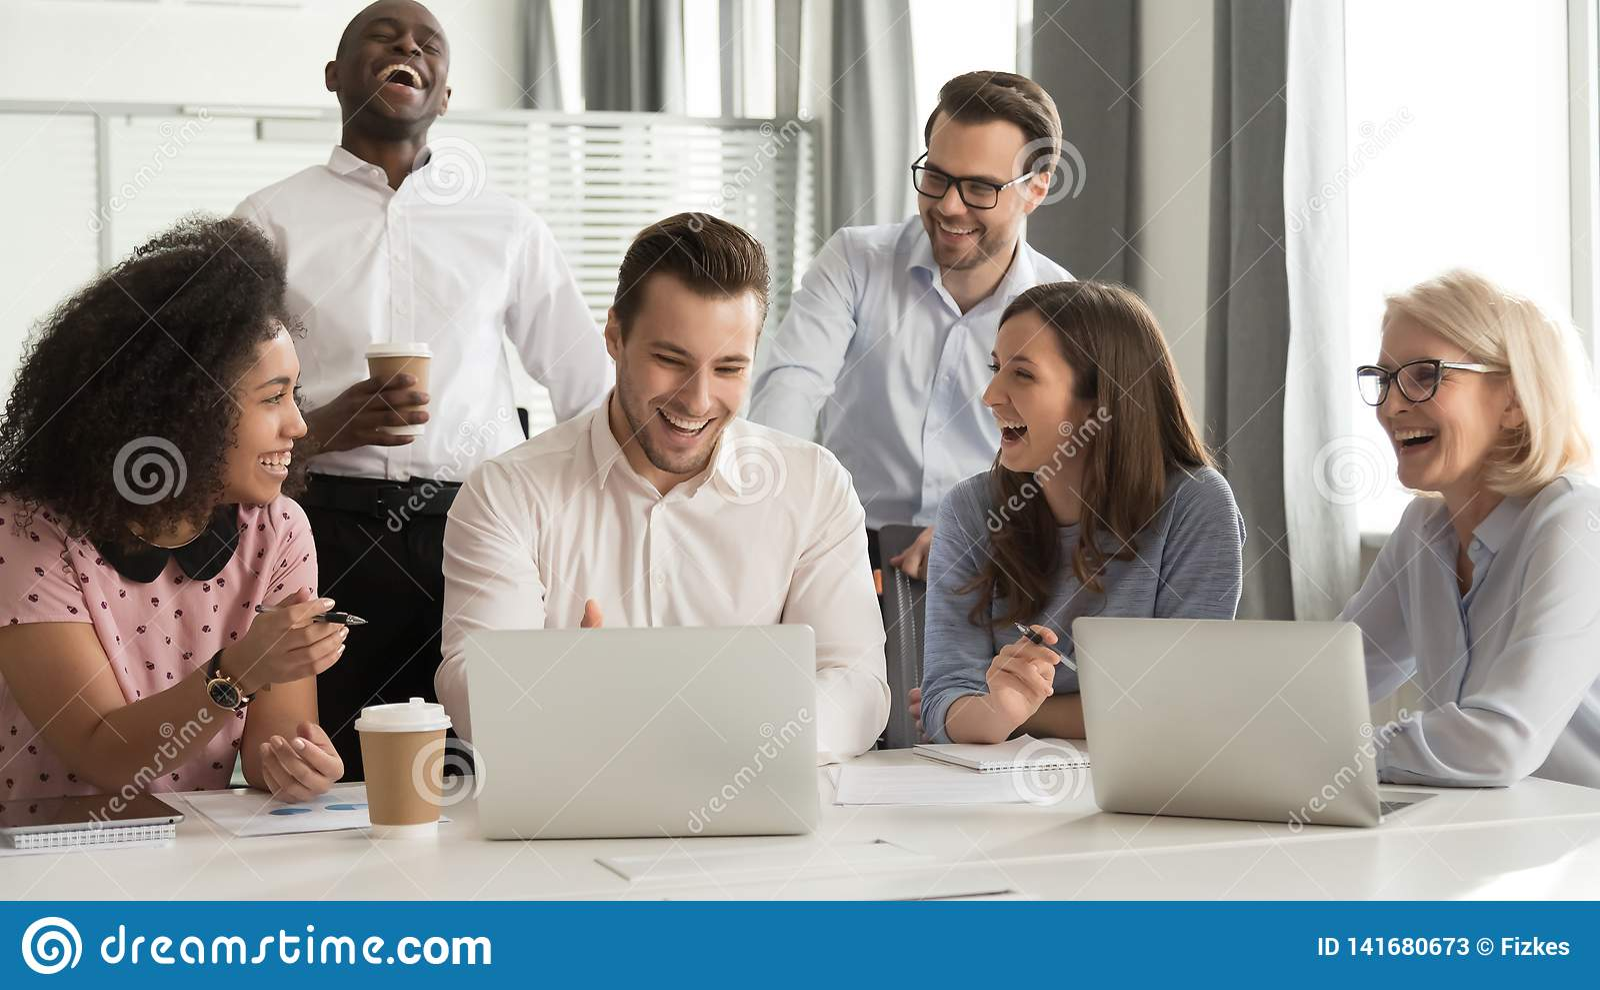 Gelukkig divers beambtenteam die samen bij groepsvergadering lachen